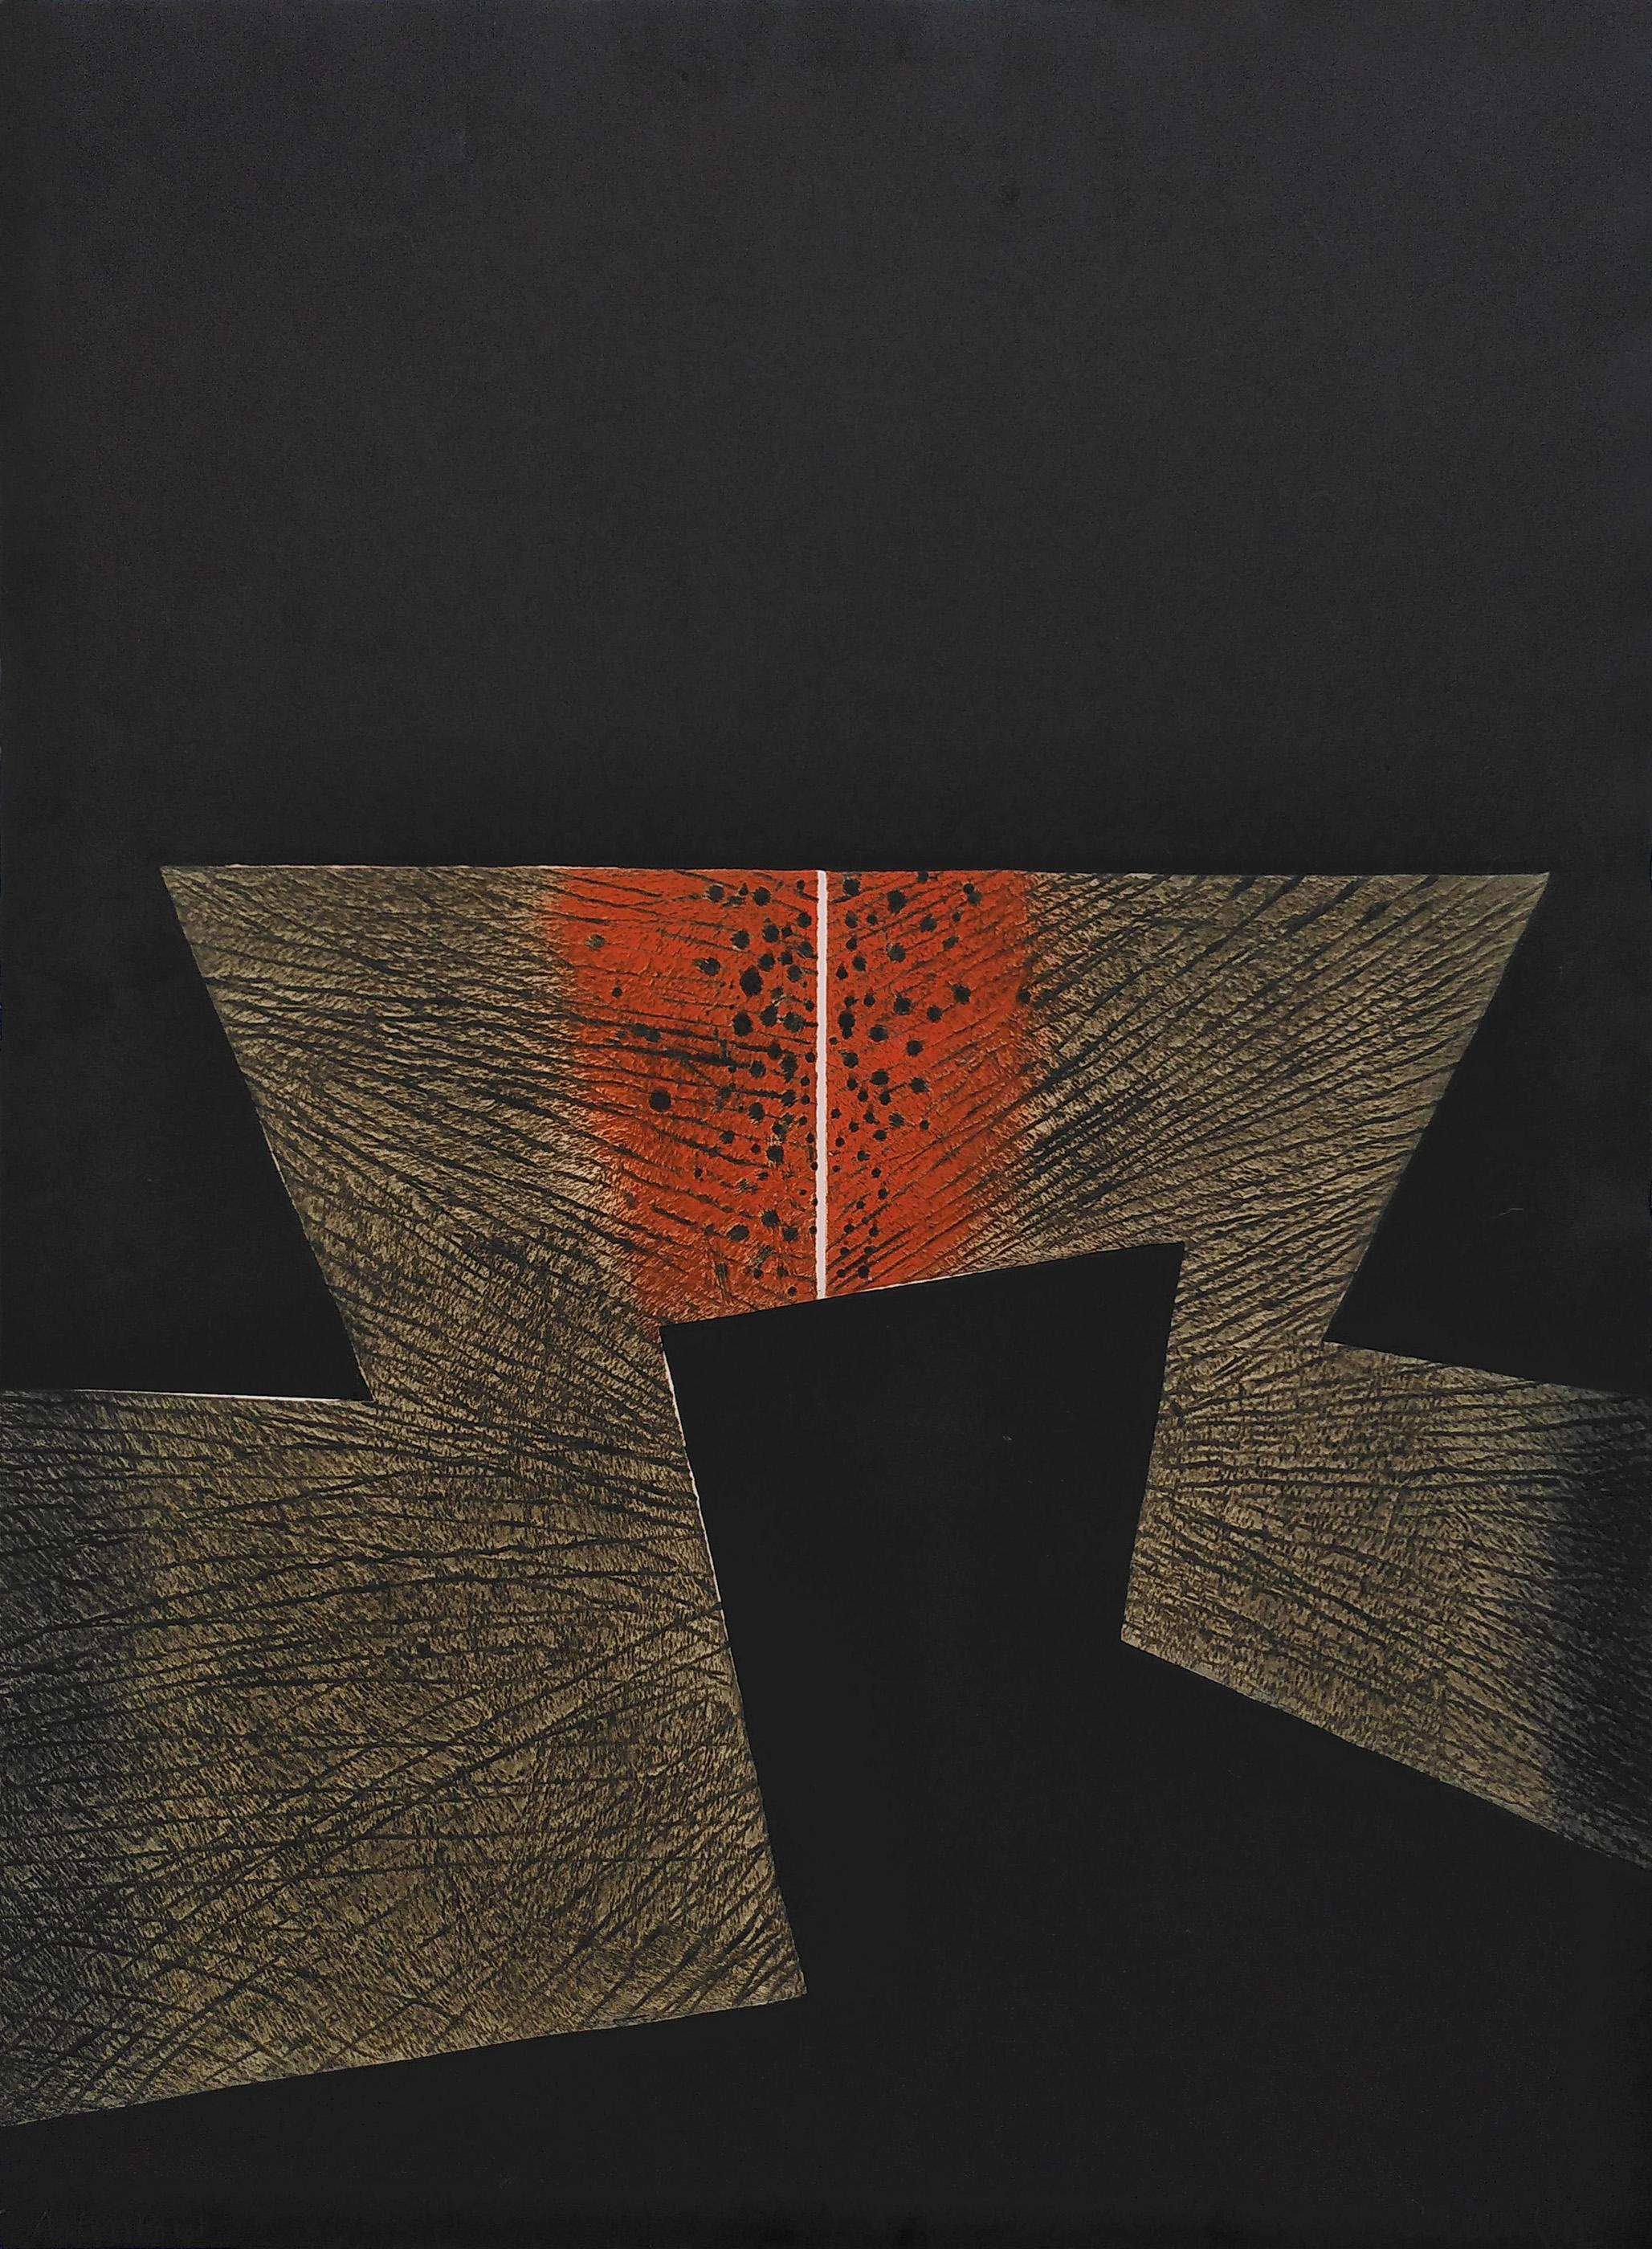 Arun Bose, Black Lightning, Etching with Aquatint